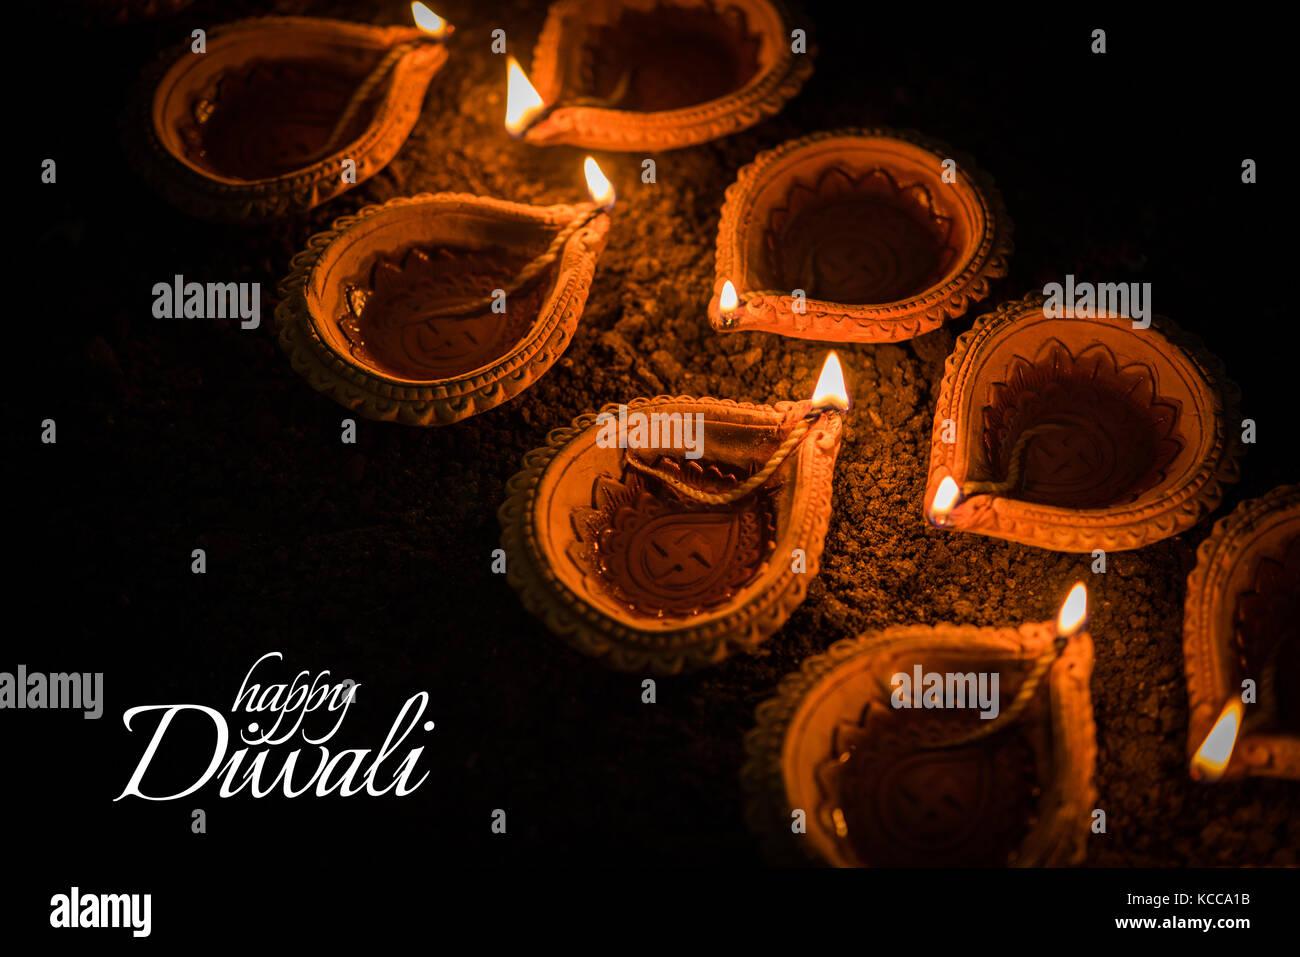 Diwali Greeting Card Stock Photos Diwali Greeting Card Stock